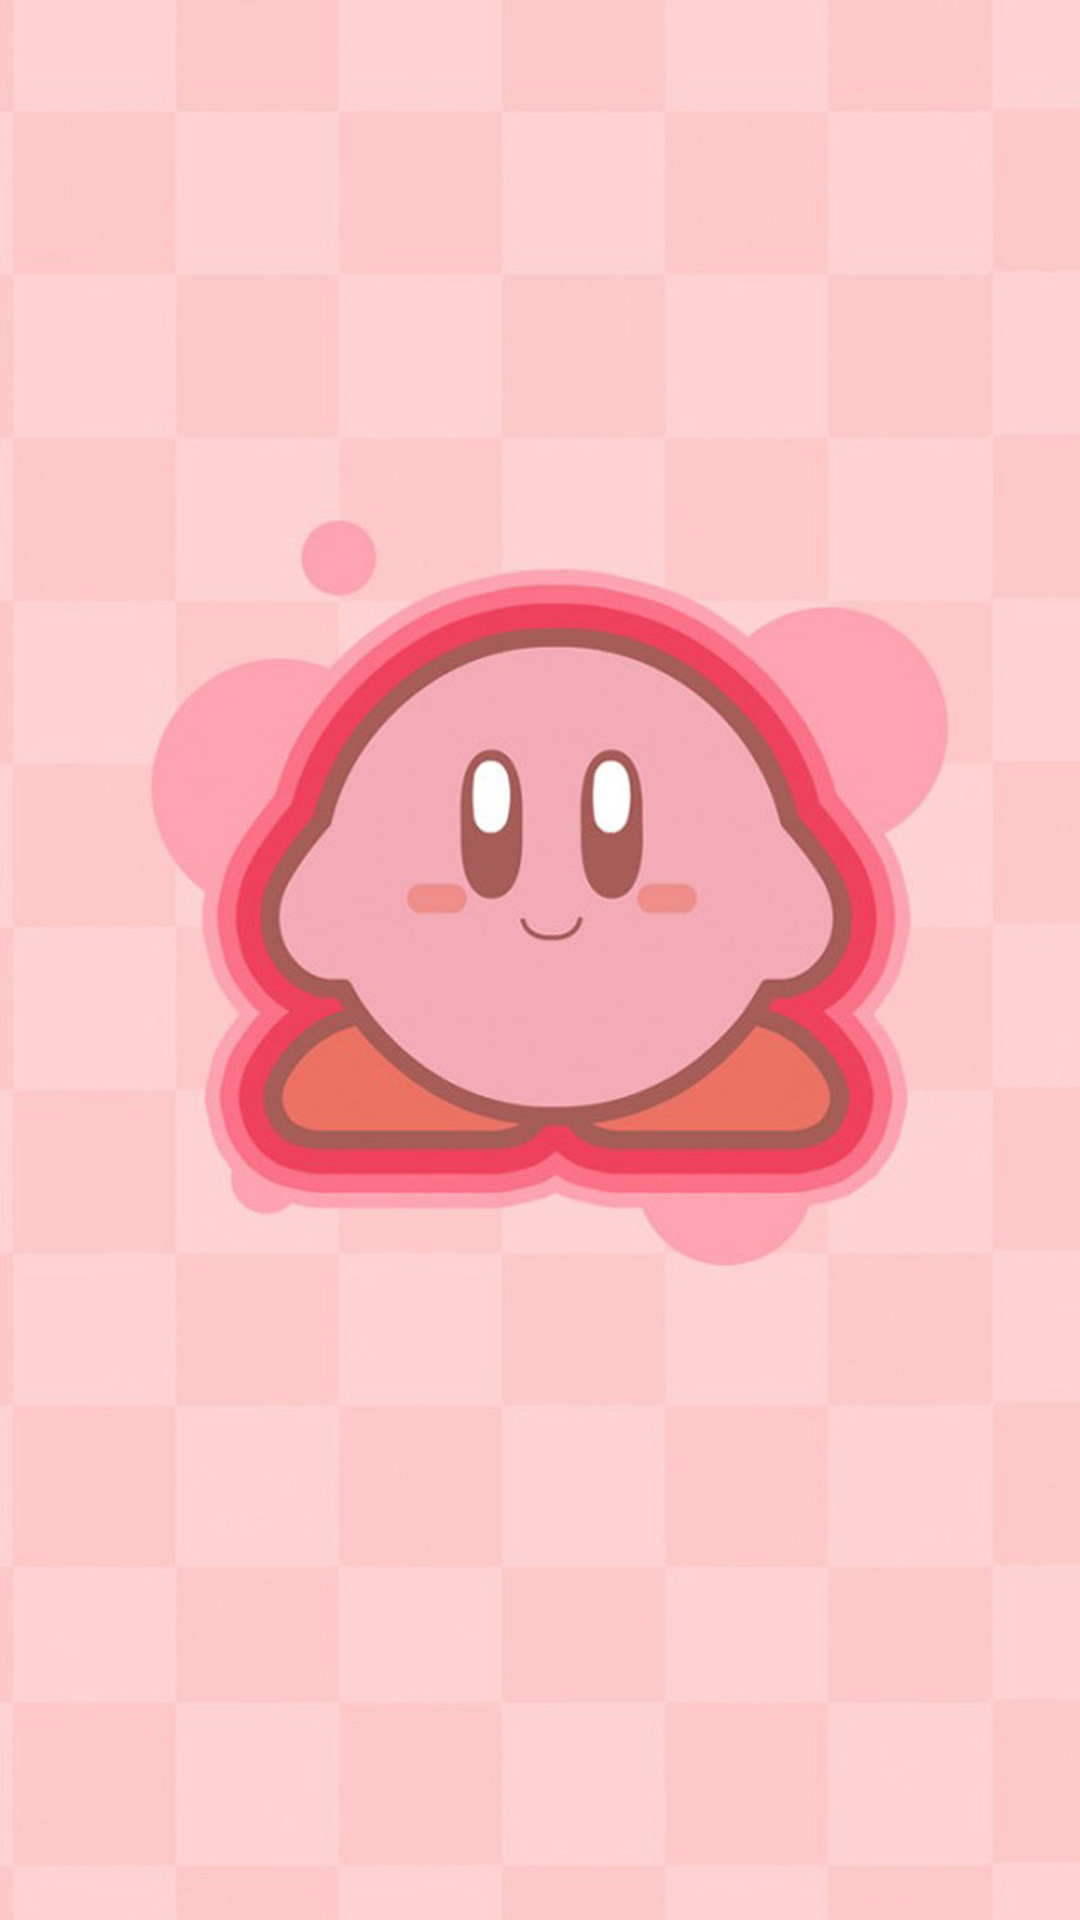 Cute Kirby Smartphone HD Wallpaper Wallpaper